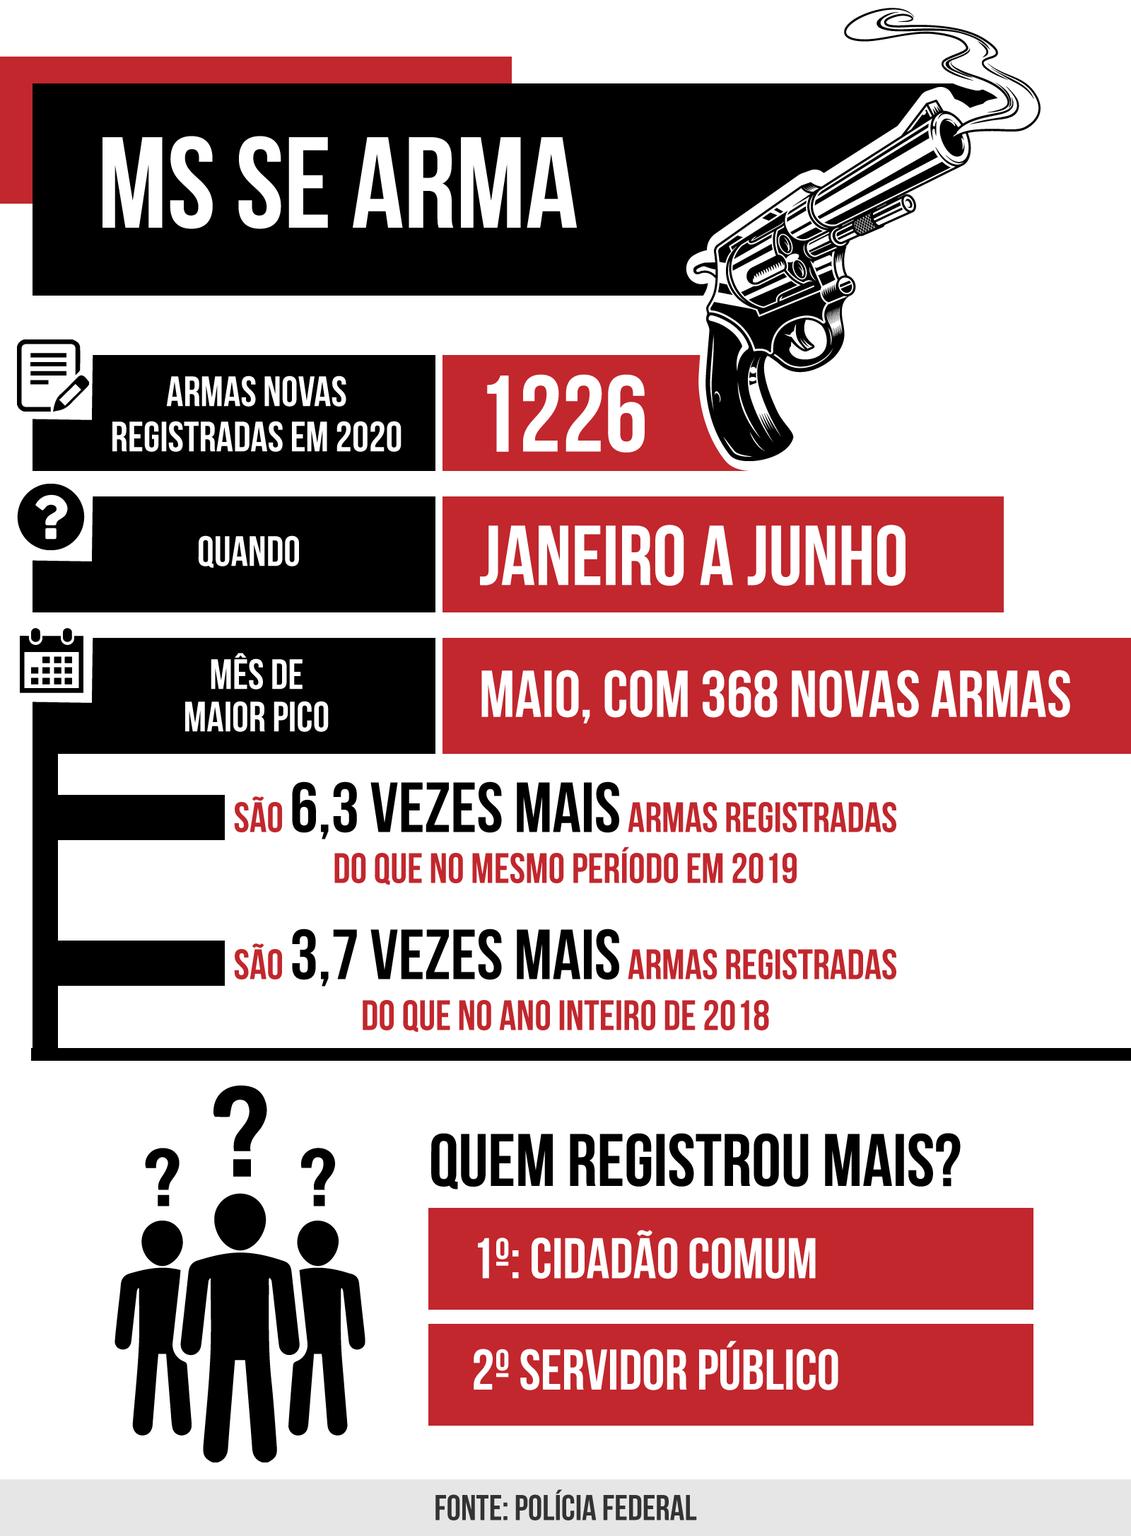 Só este ano, até junho, 1.226 novas armas (Arte: Thiago Mendes)